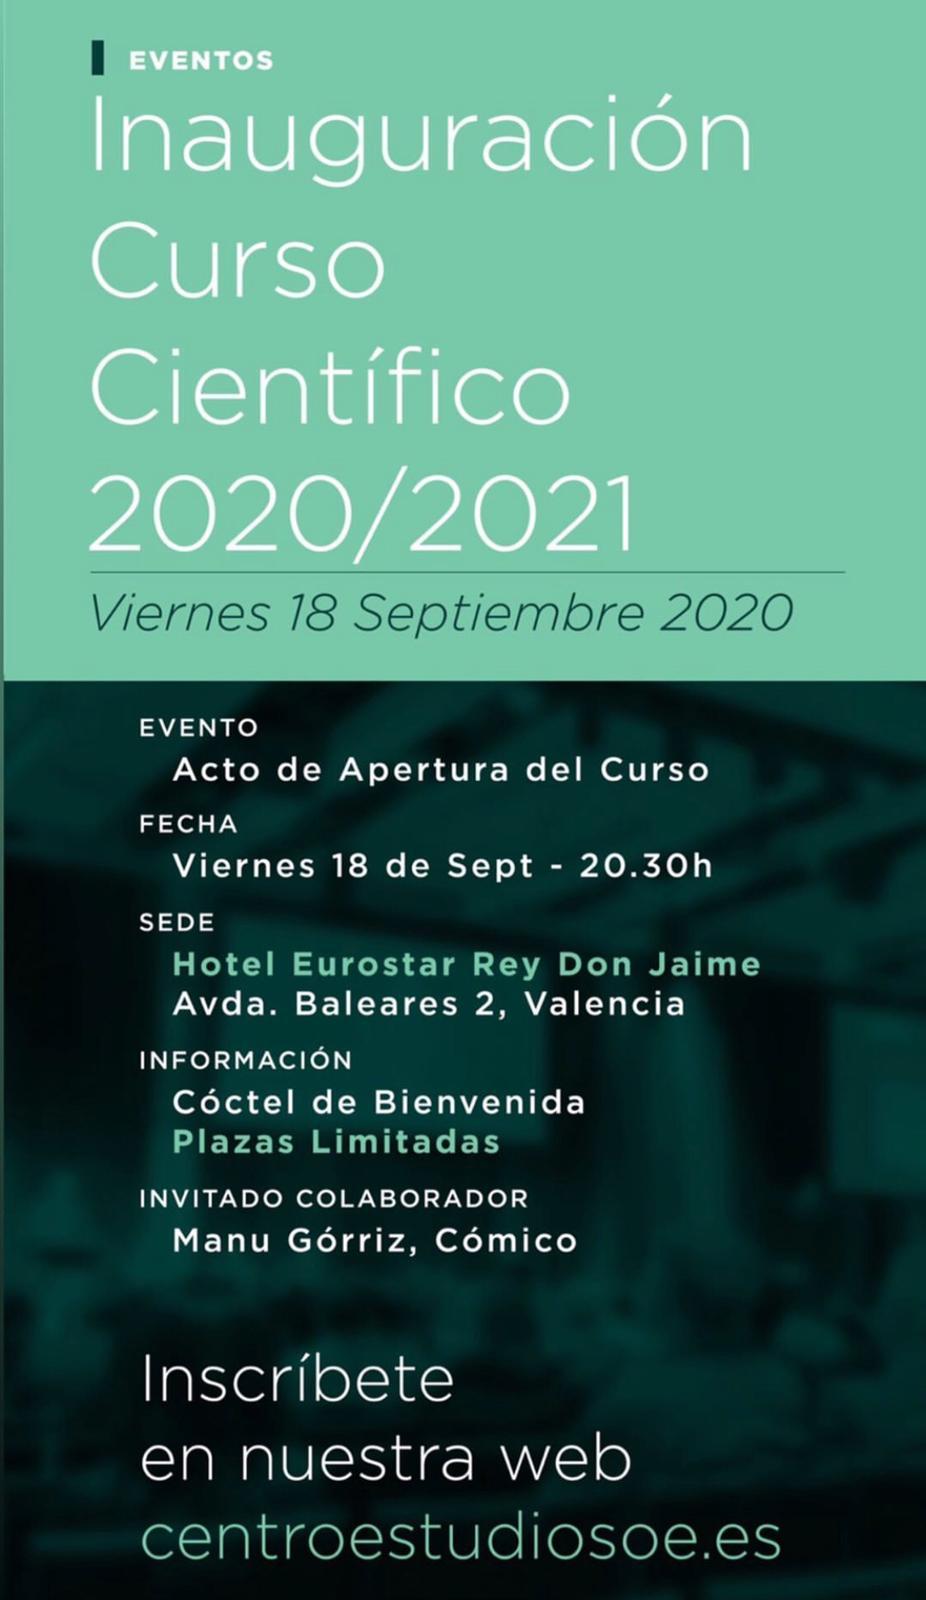 CENTRO ESTUDIOS ODONTO-ESTOMATOLÓGICOS DE VALENCIA Acto de apertura Curso Científico del CEOE 2020-2021 @ Hotel Eurostars Rey Don Jaime